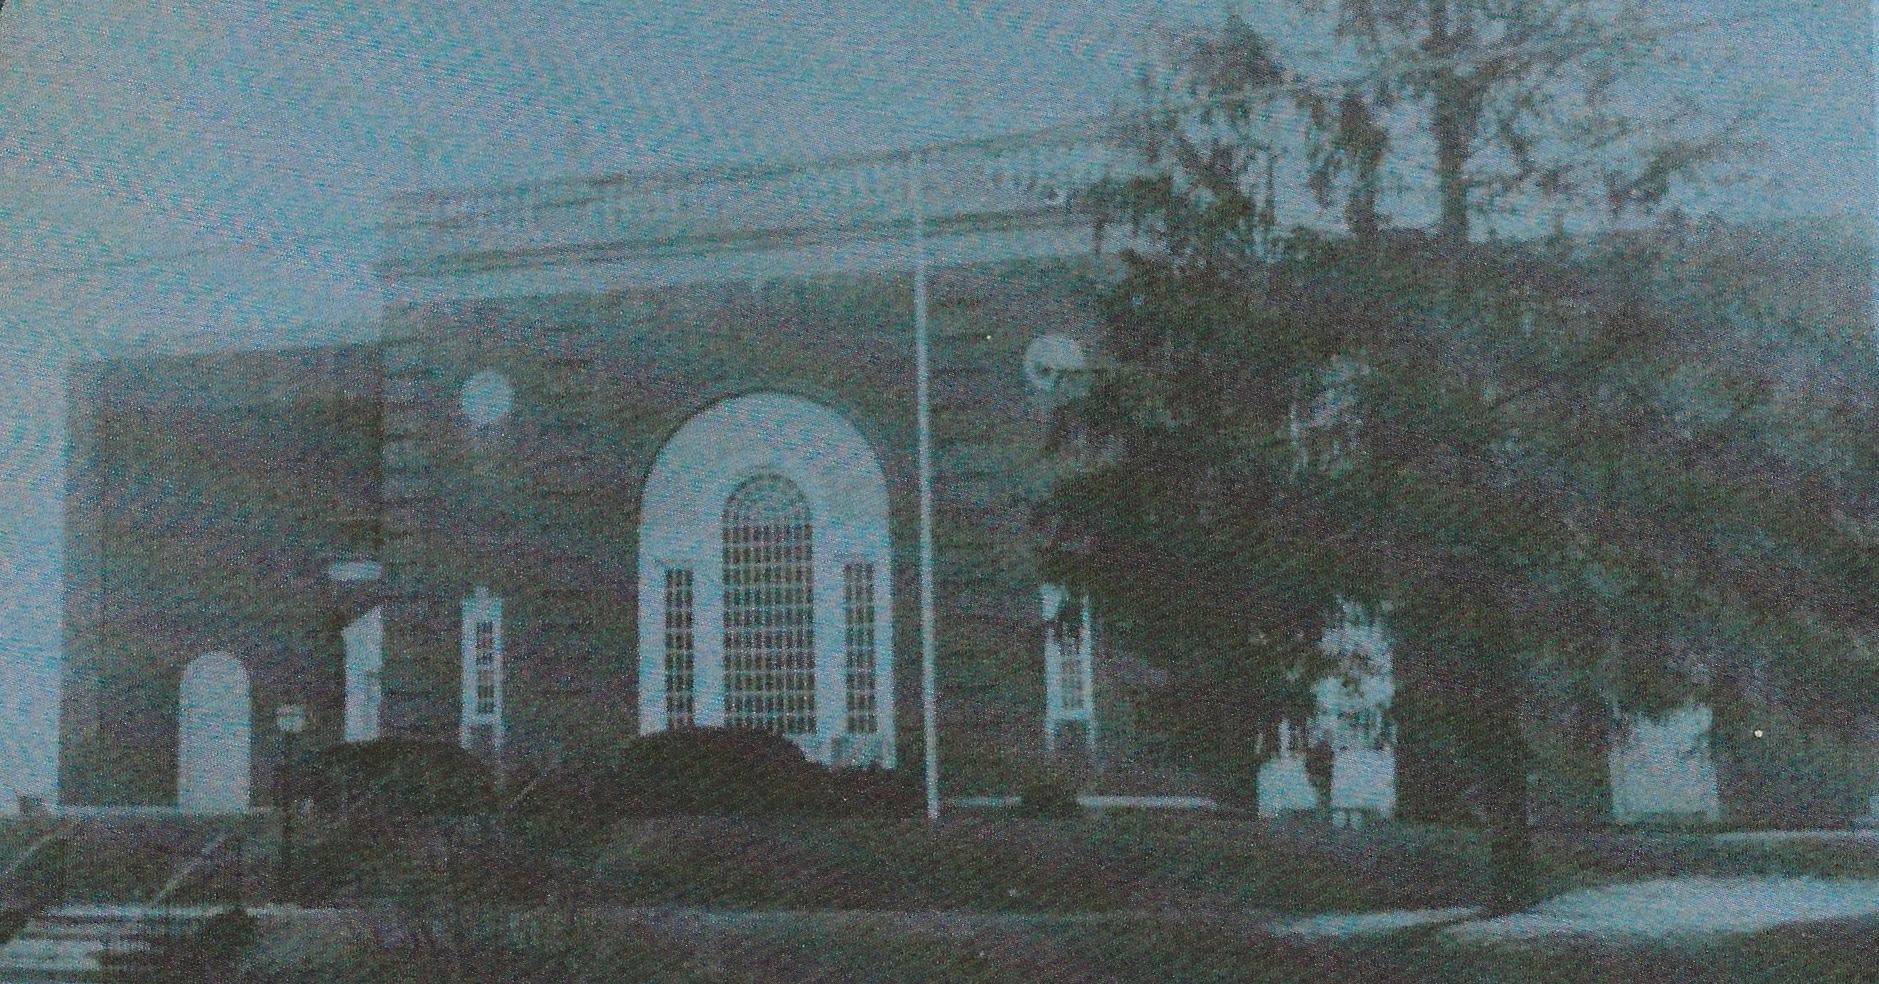 Womelsdorf School